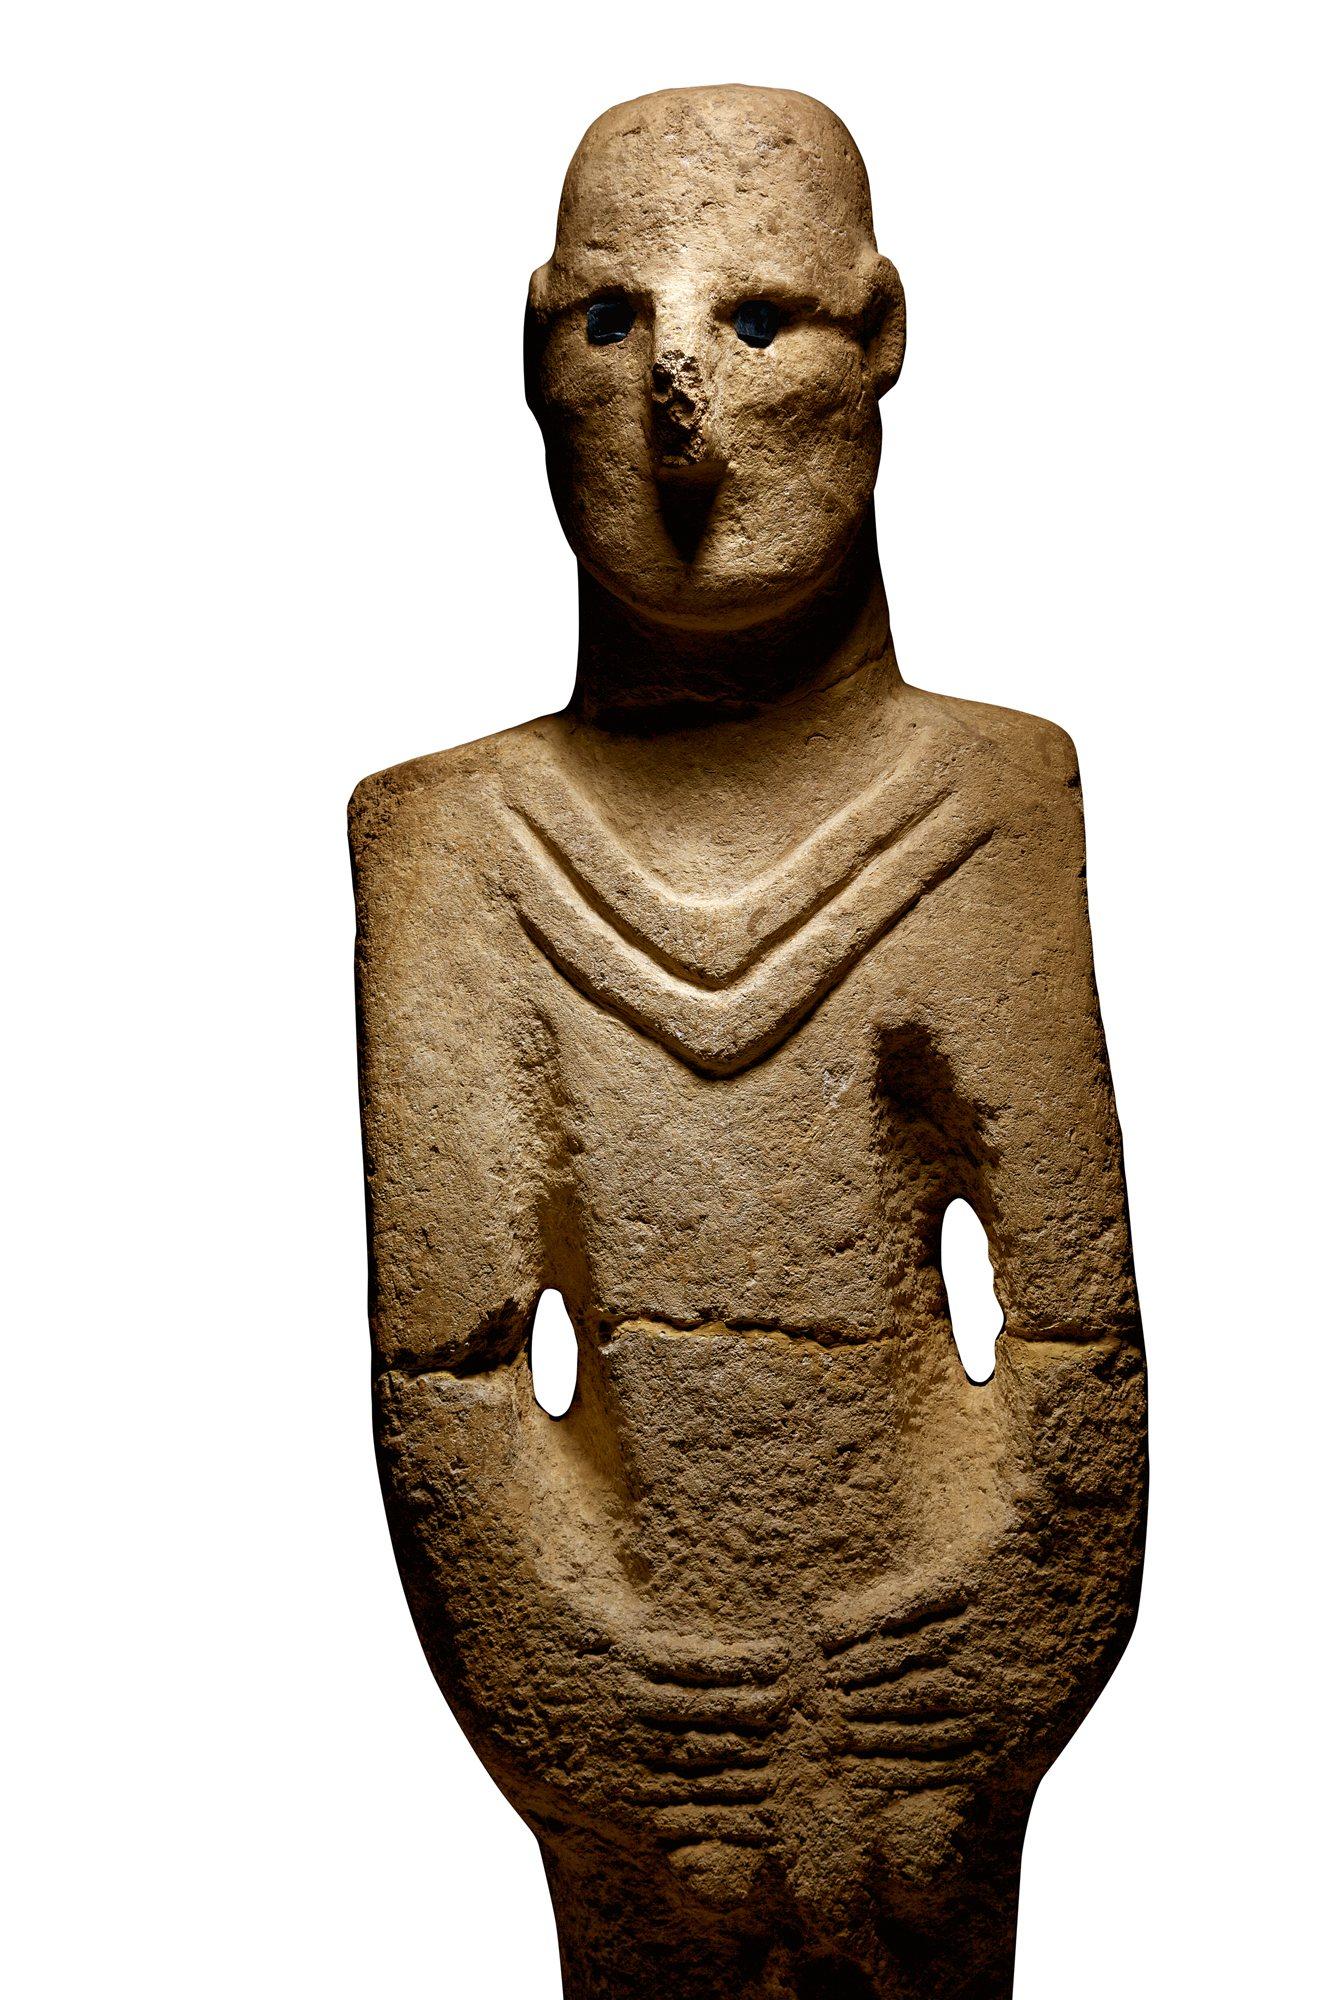 Representación humana en piedra localizada cerca de Göbekli Tepe.